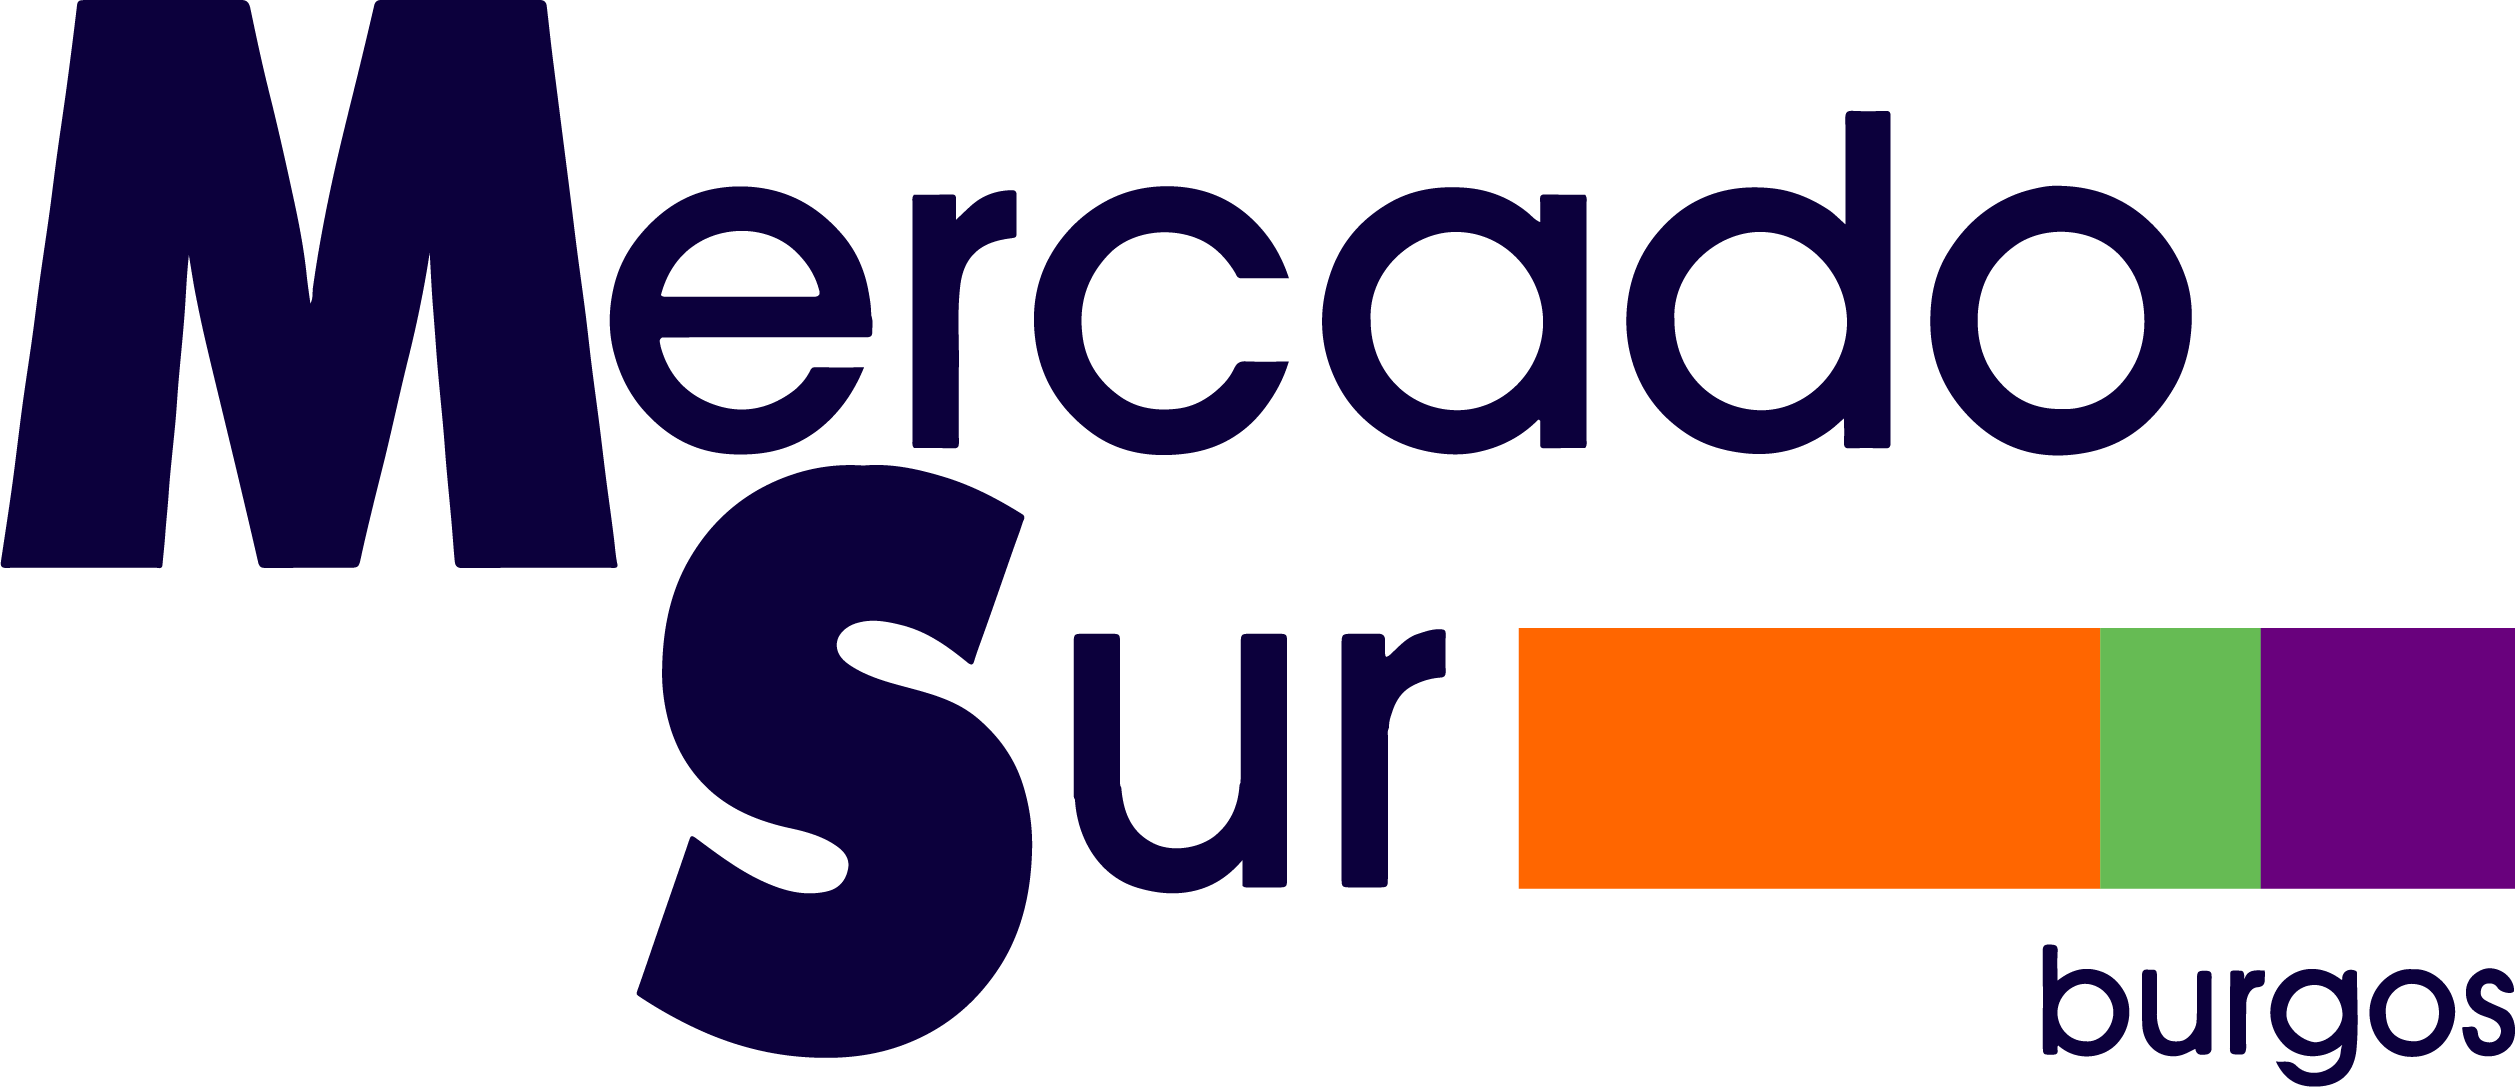 Mercado Sur Burgos